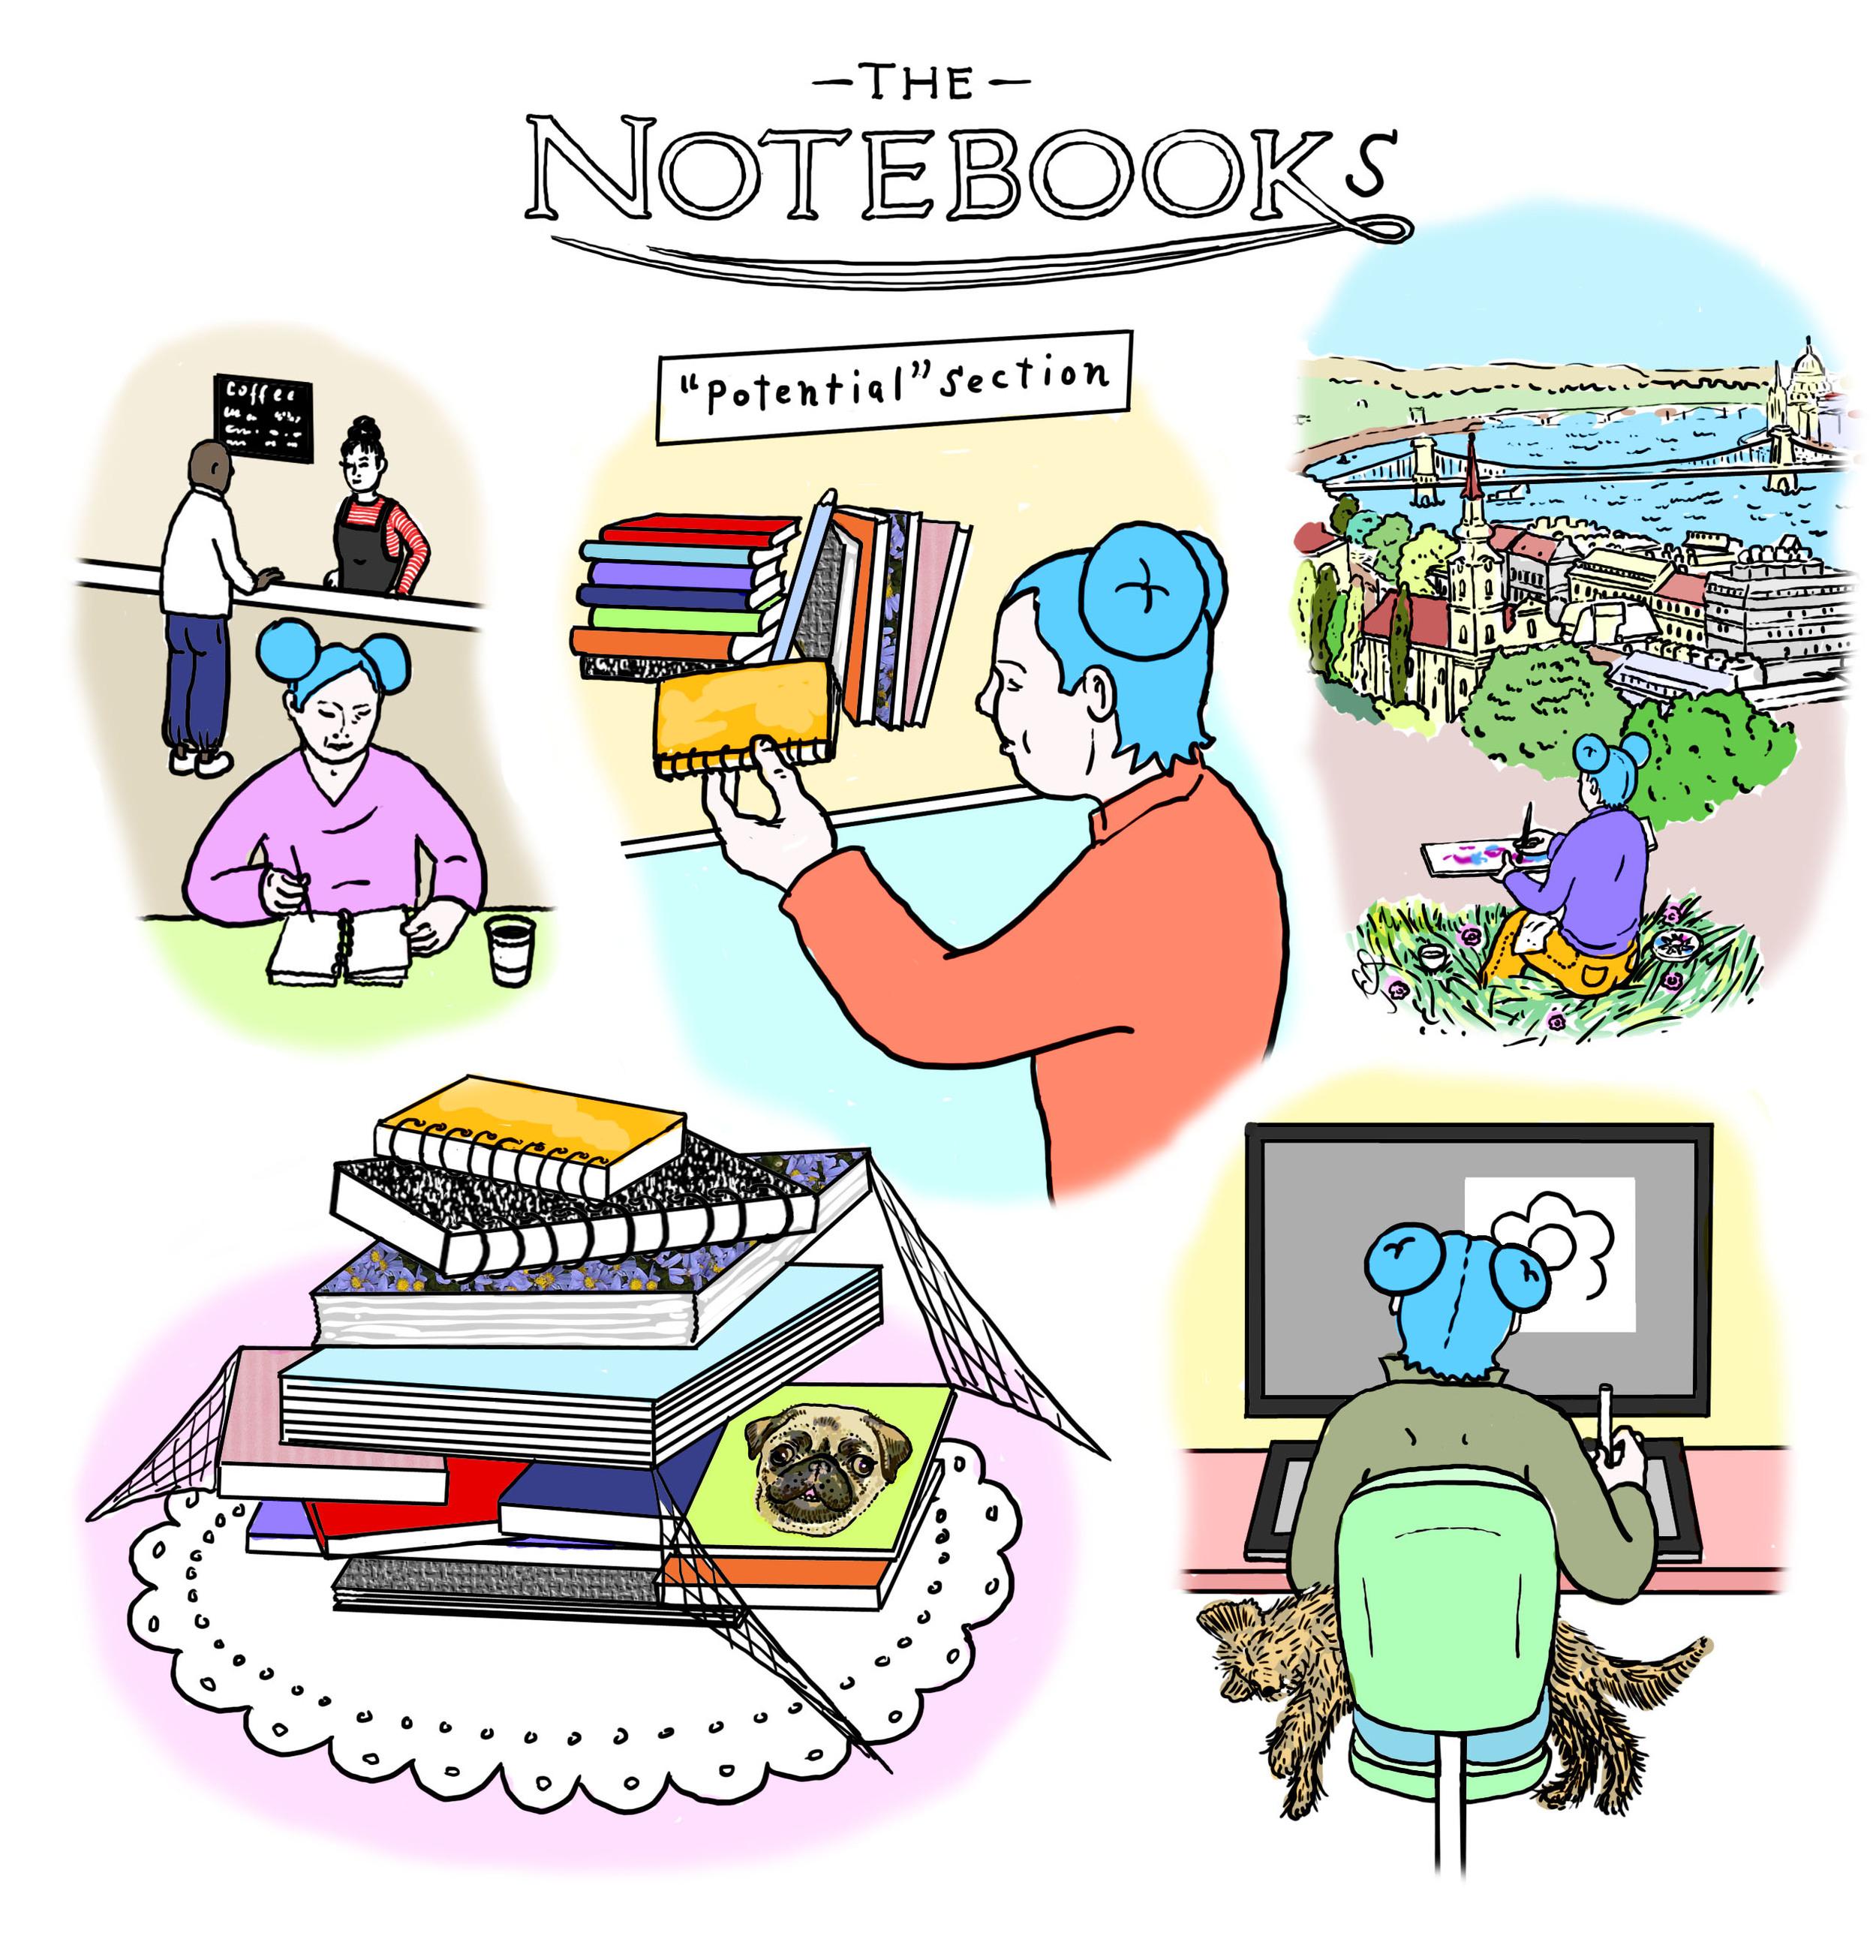 TheNotebooks.jpg